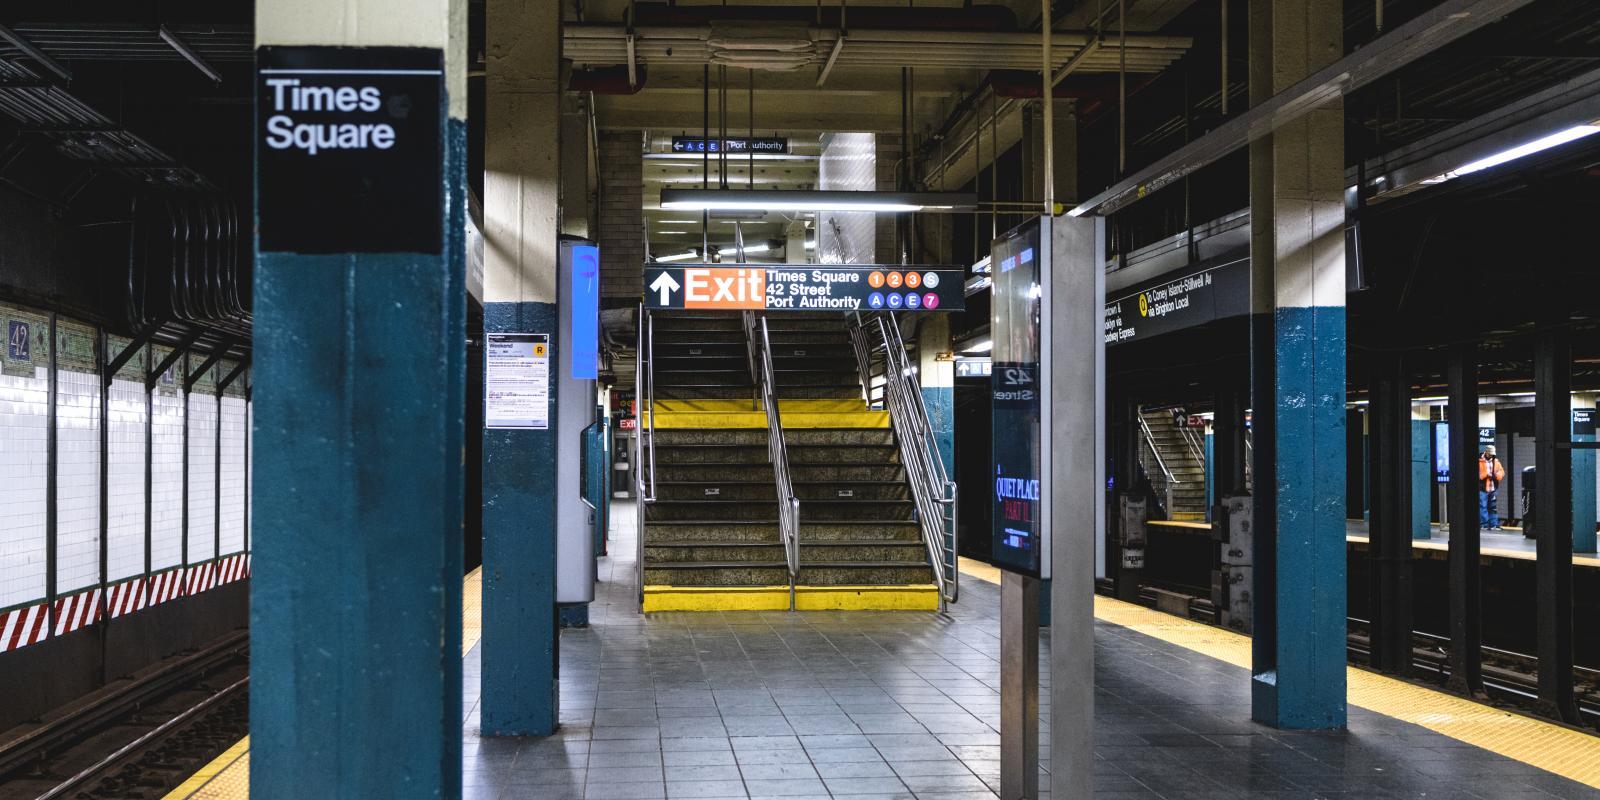 Subway Stations during Corona Virus